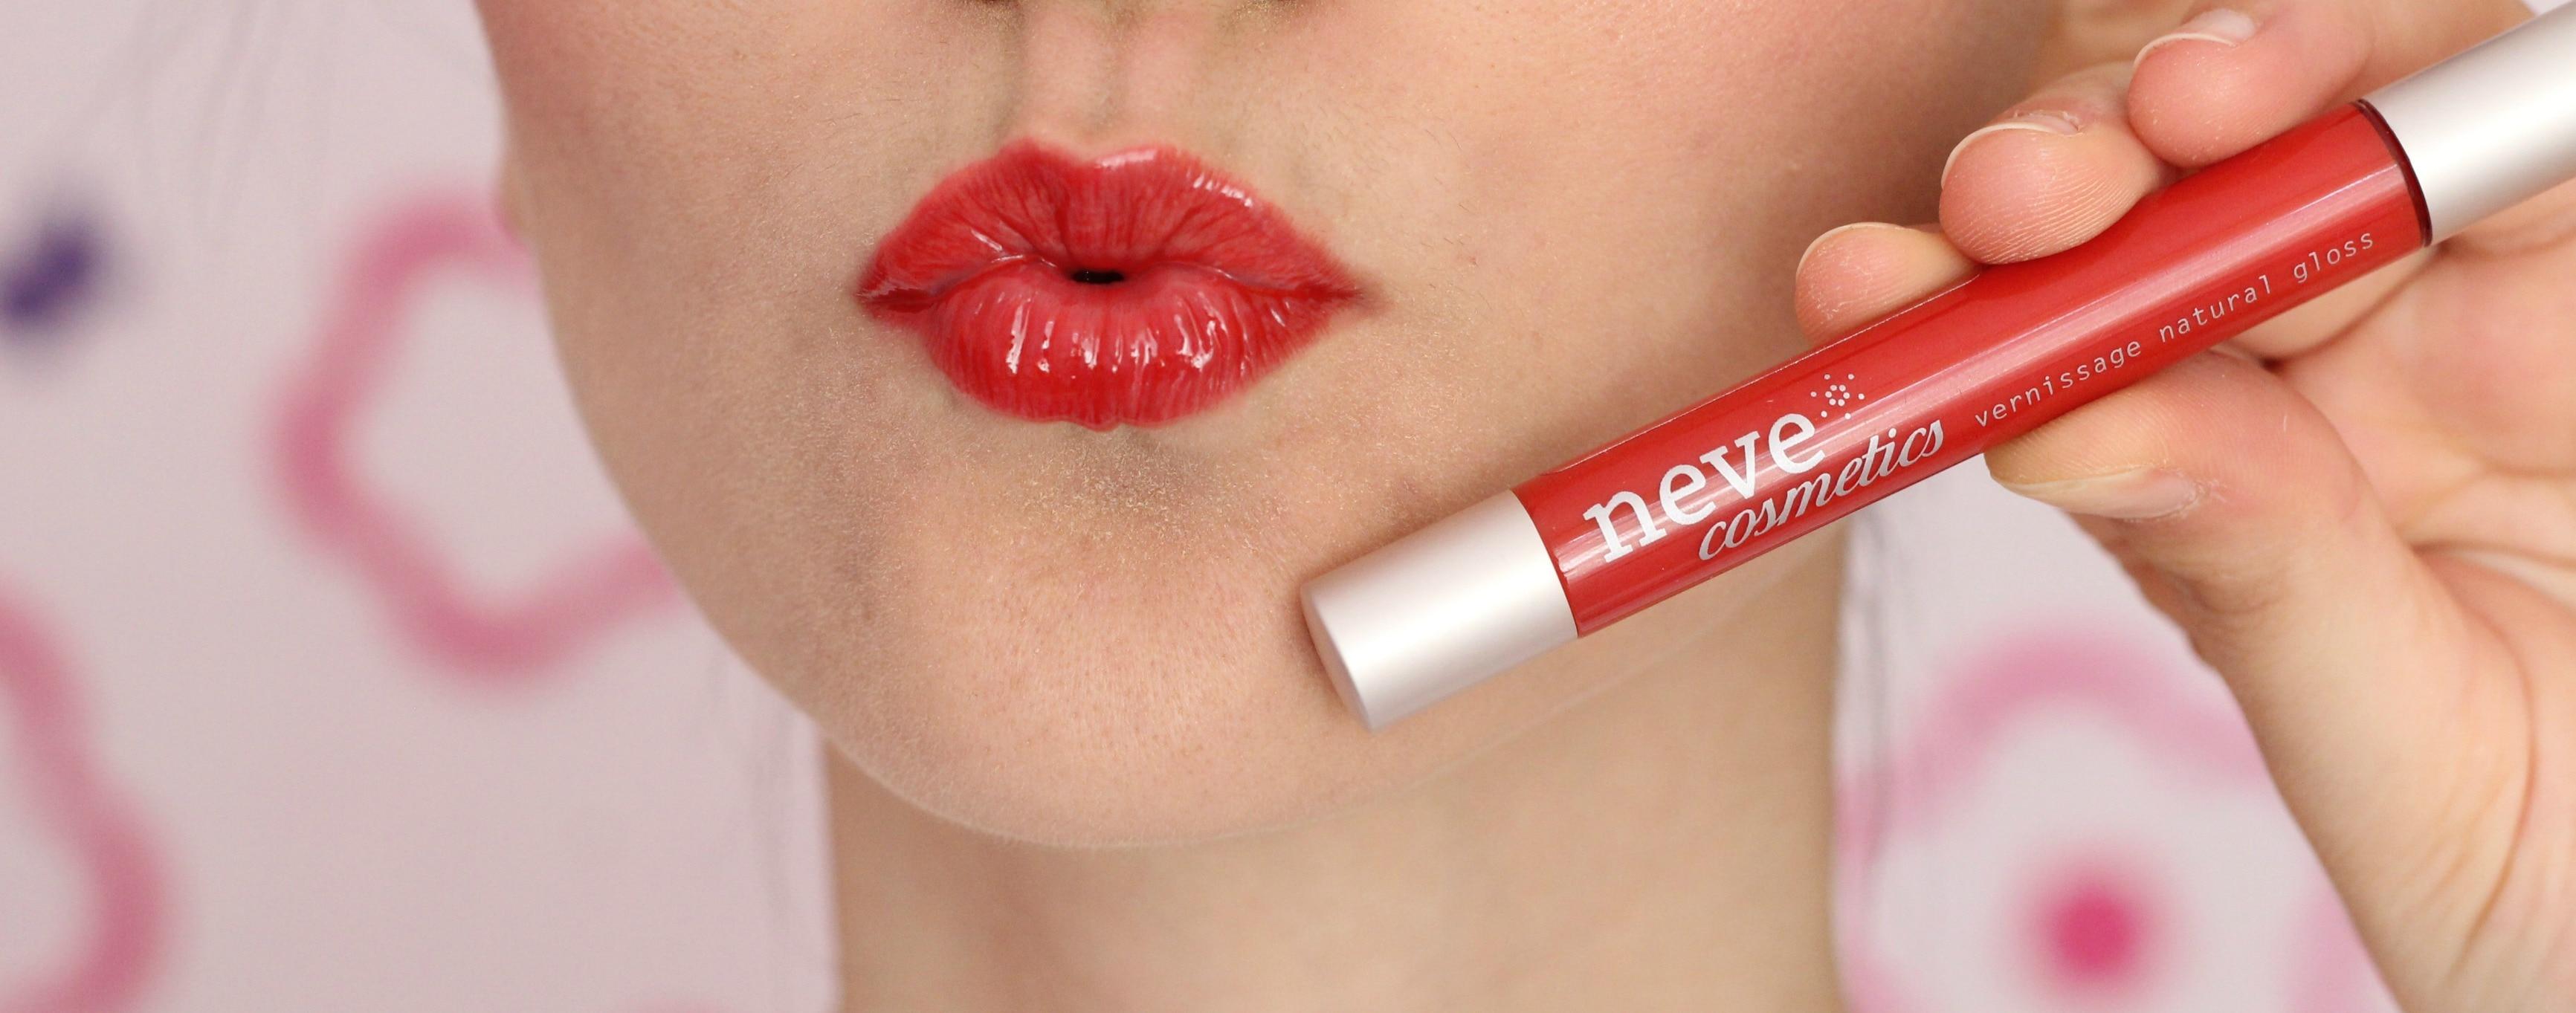 vernissage natural gloss neve cosmetics